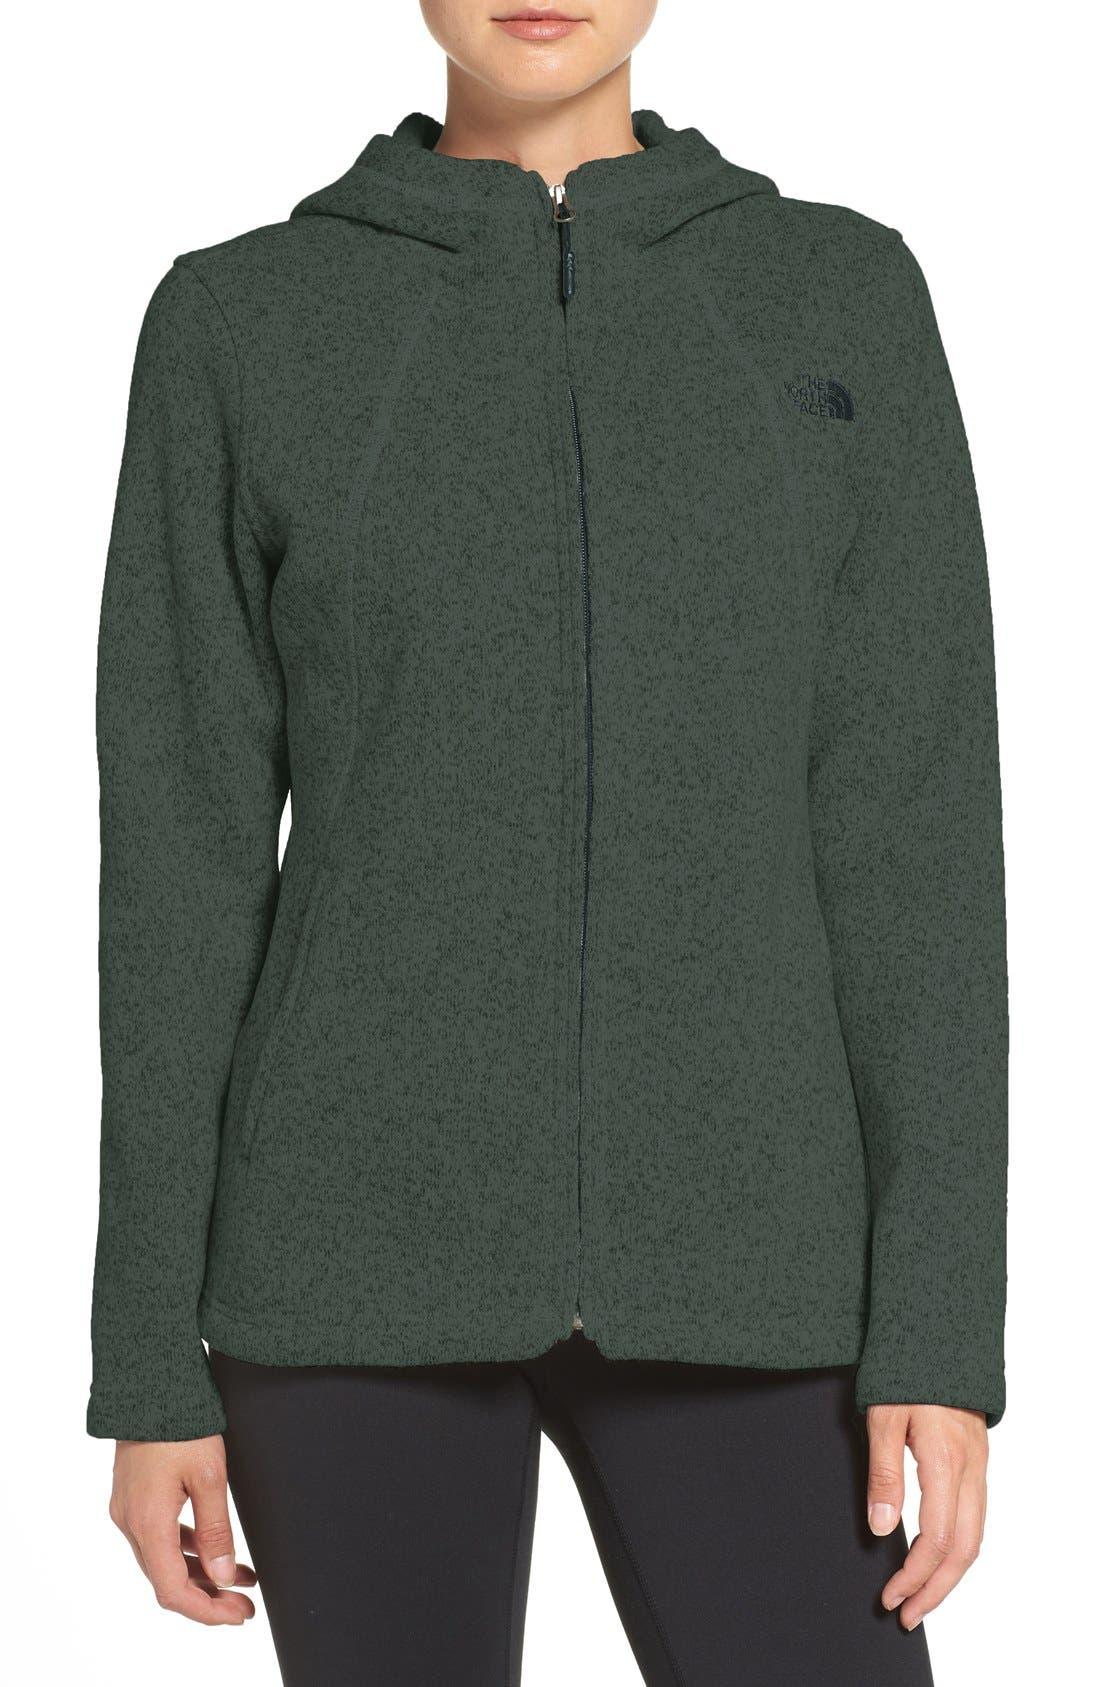 'Crescent' Fleece Jacket,                             Main thumbnail 6, color,